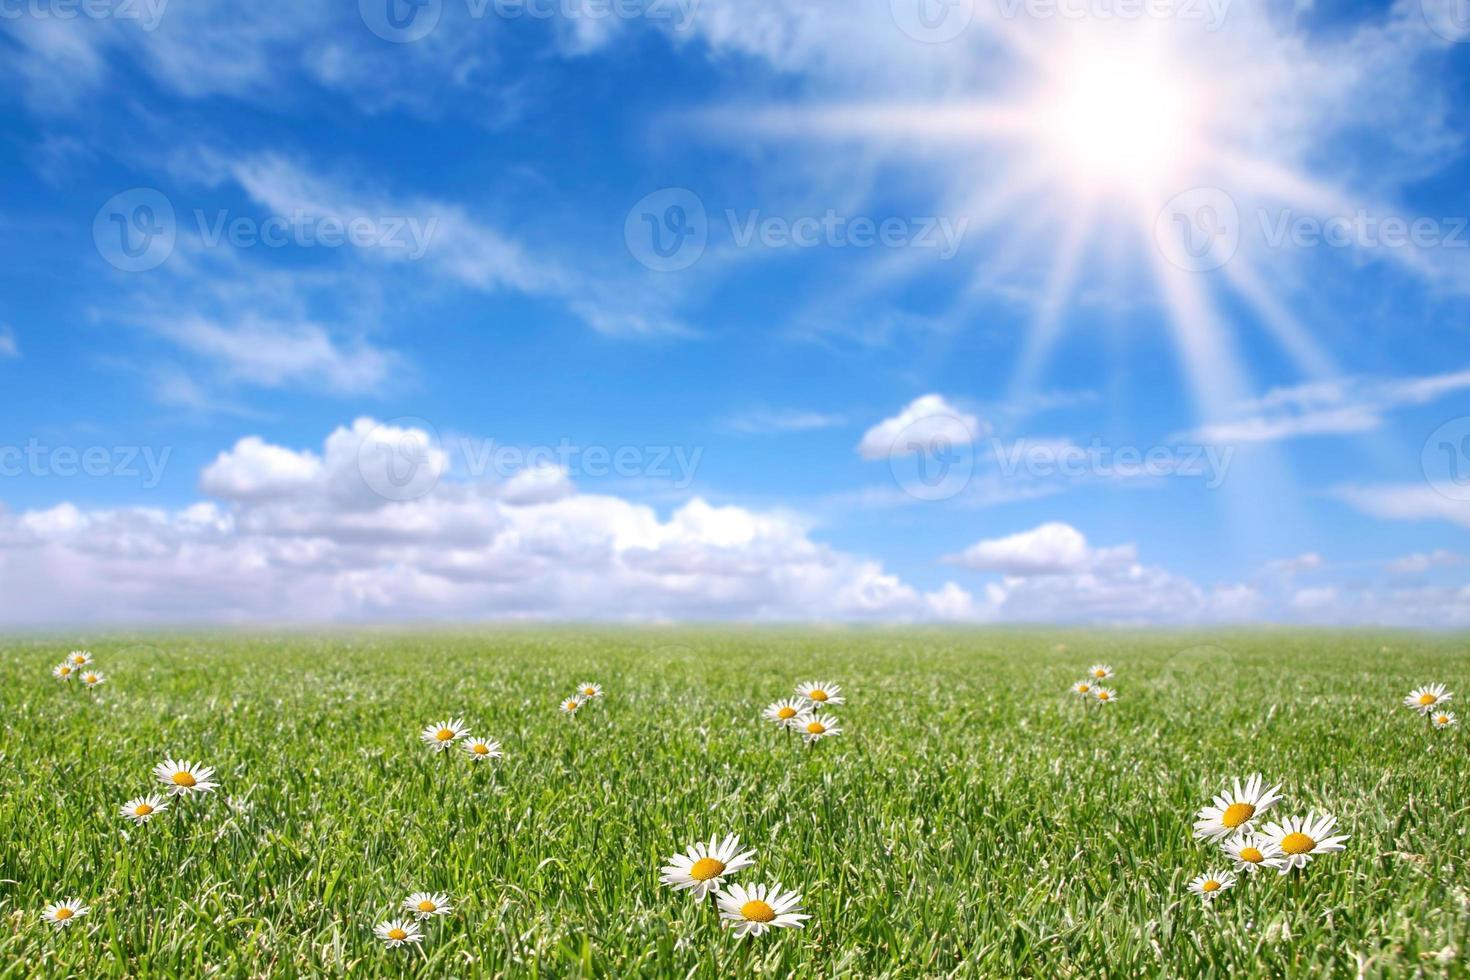 prairie de champ ensoleillé serein au printemps photo